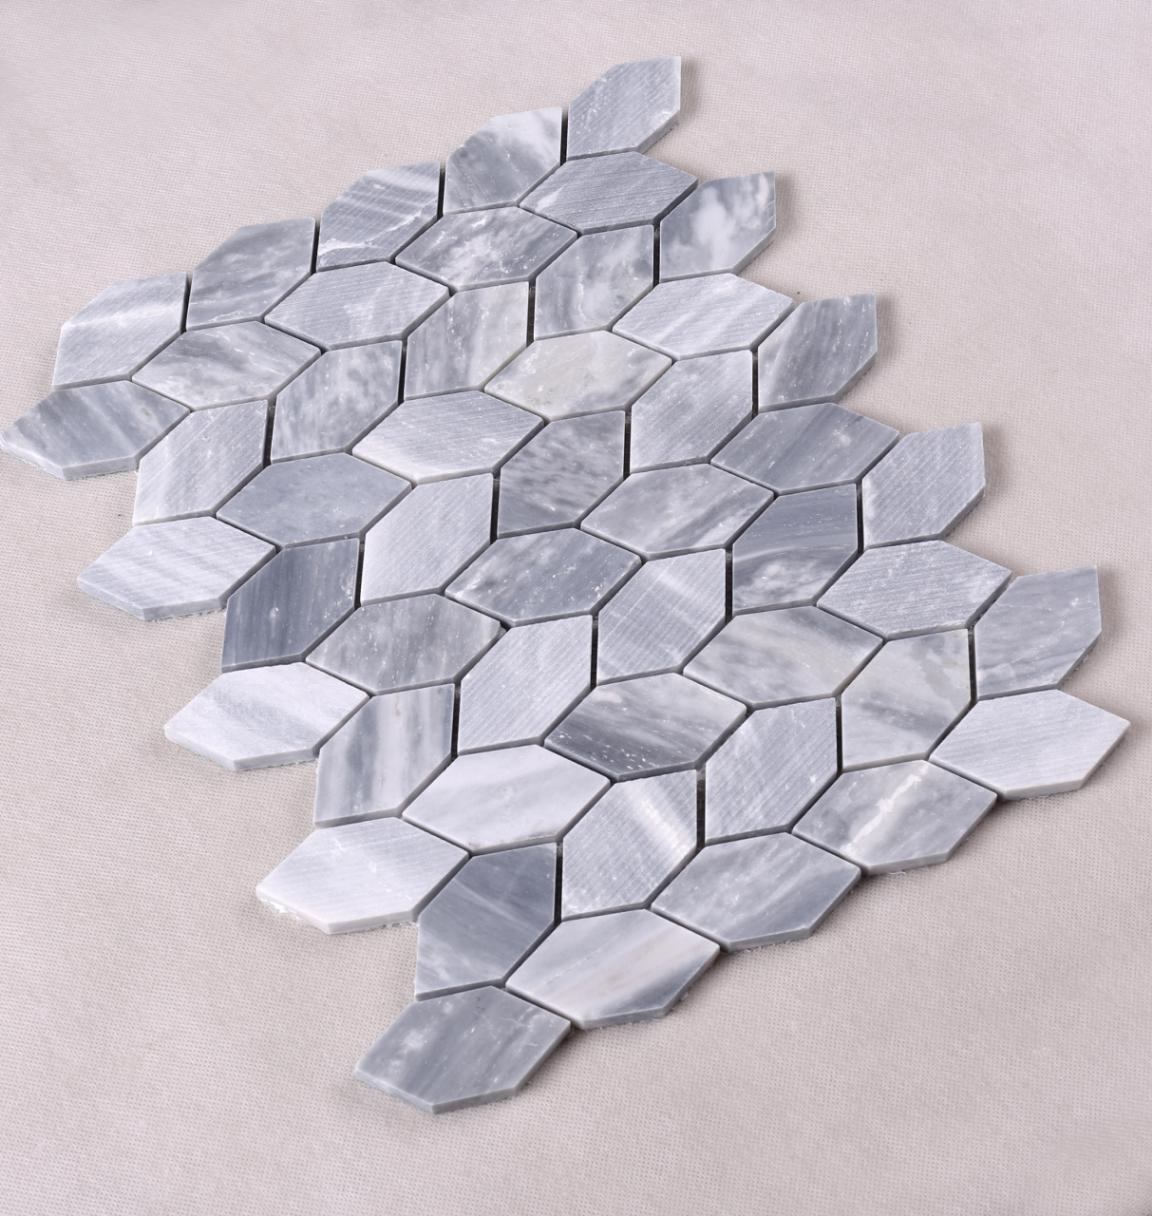 Heng Xing floor travertine stone inquire now for backsplash-3